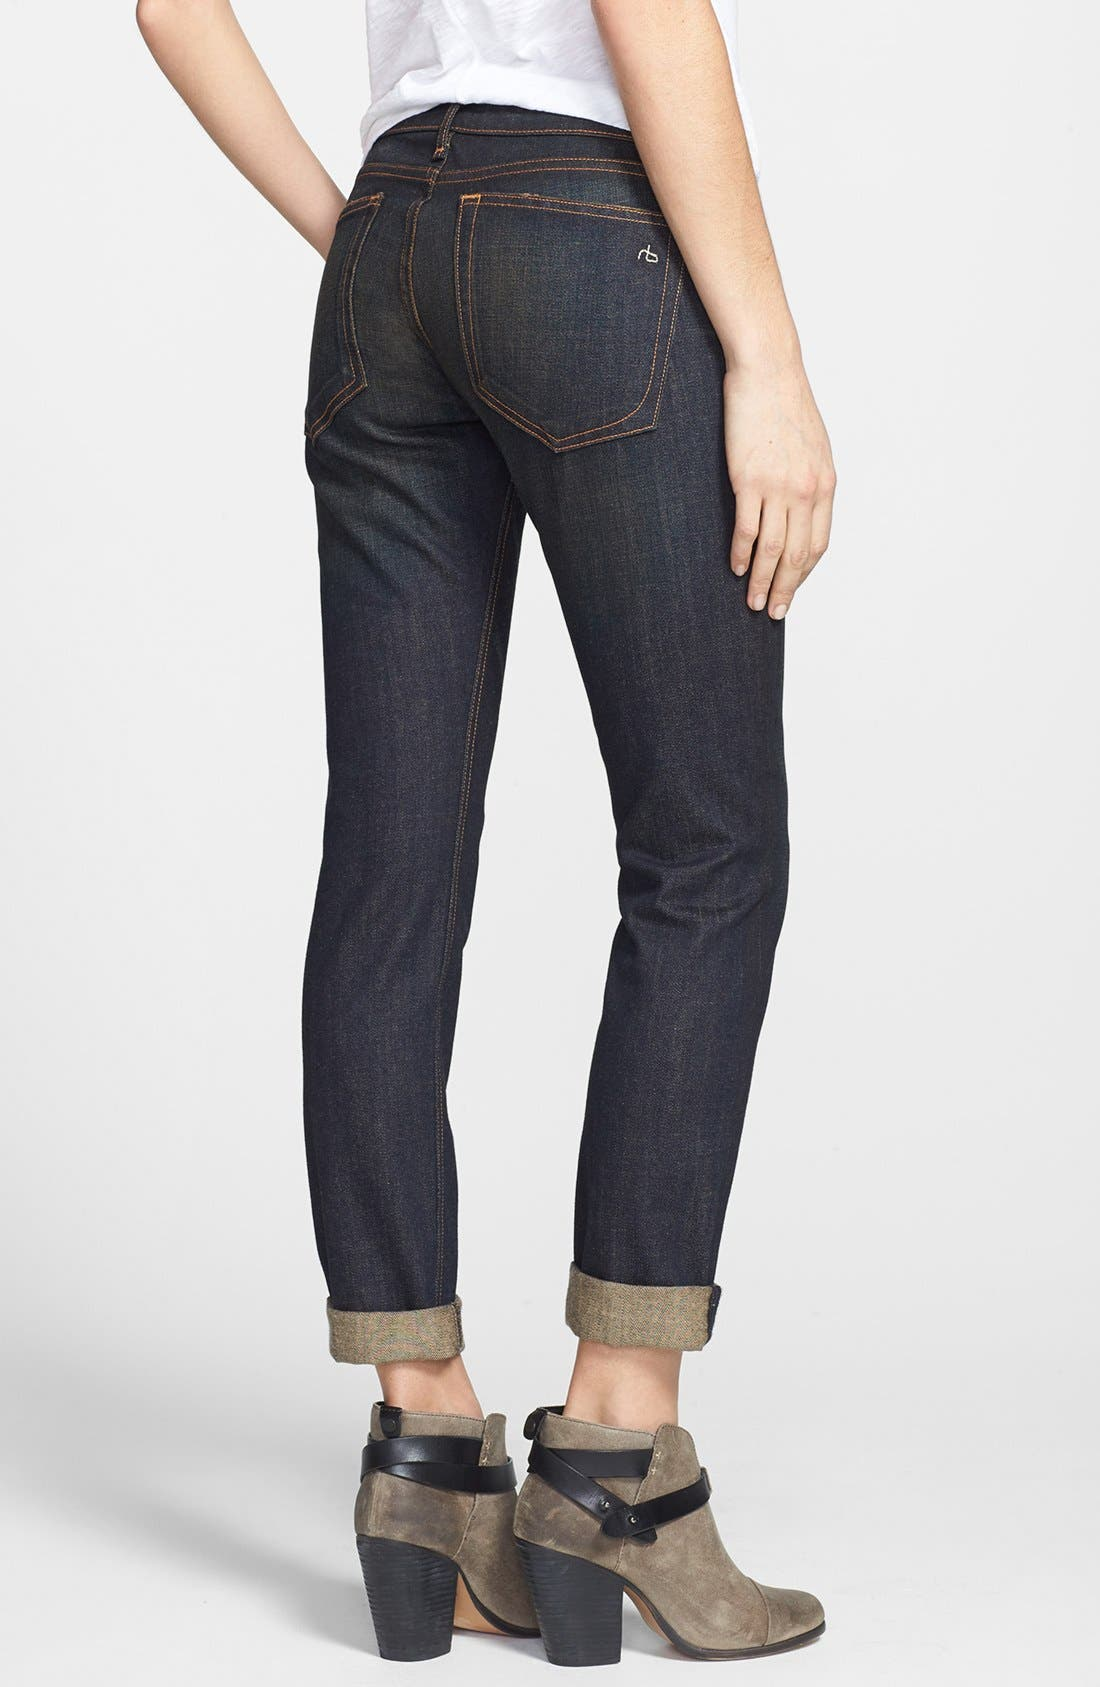 Alternate Image 2  - rag & bone/JEAN 'The Dre' Slim Fit Boyfriend Jeans (Charing)